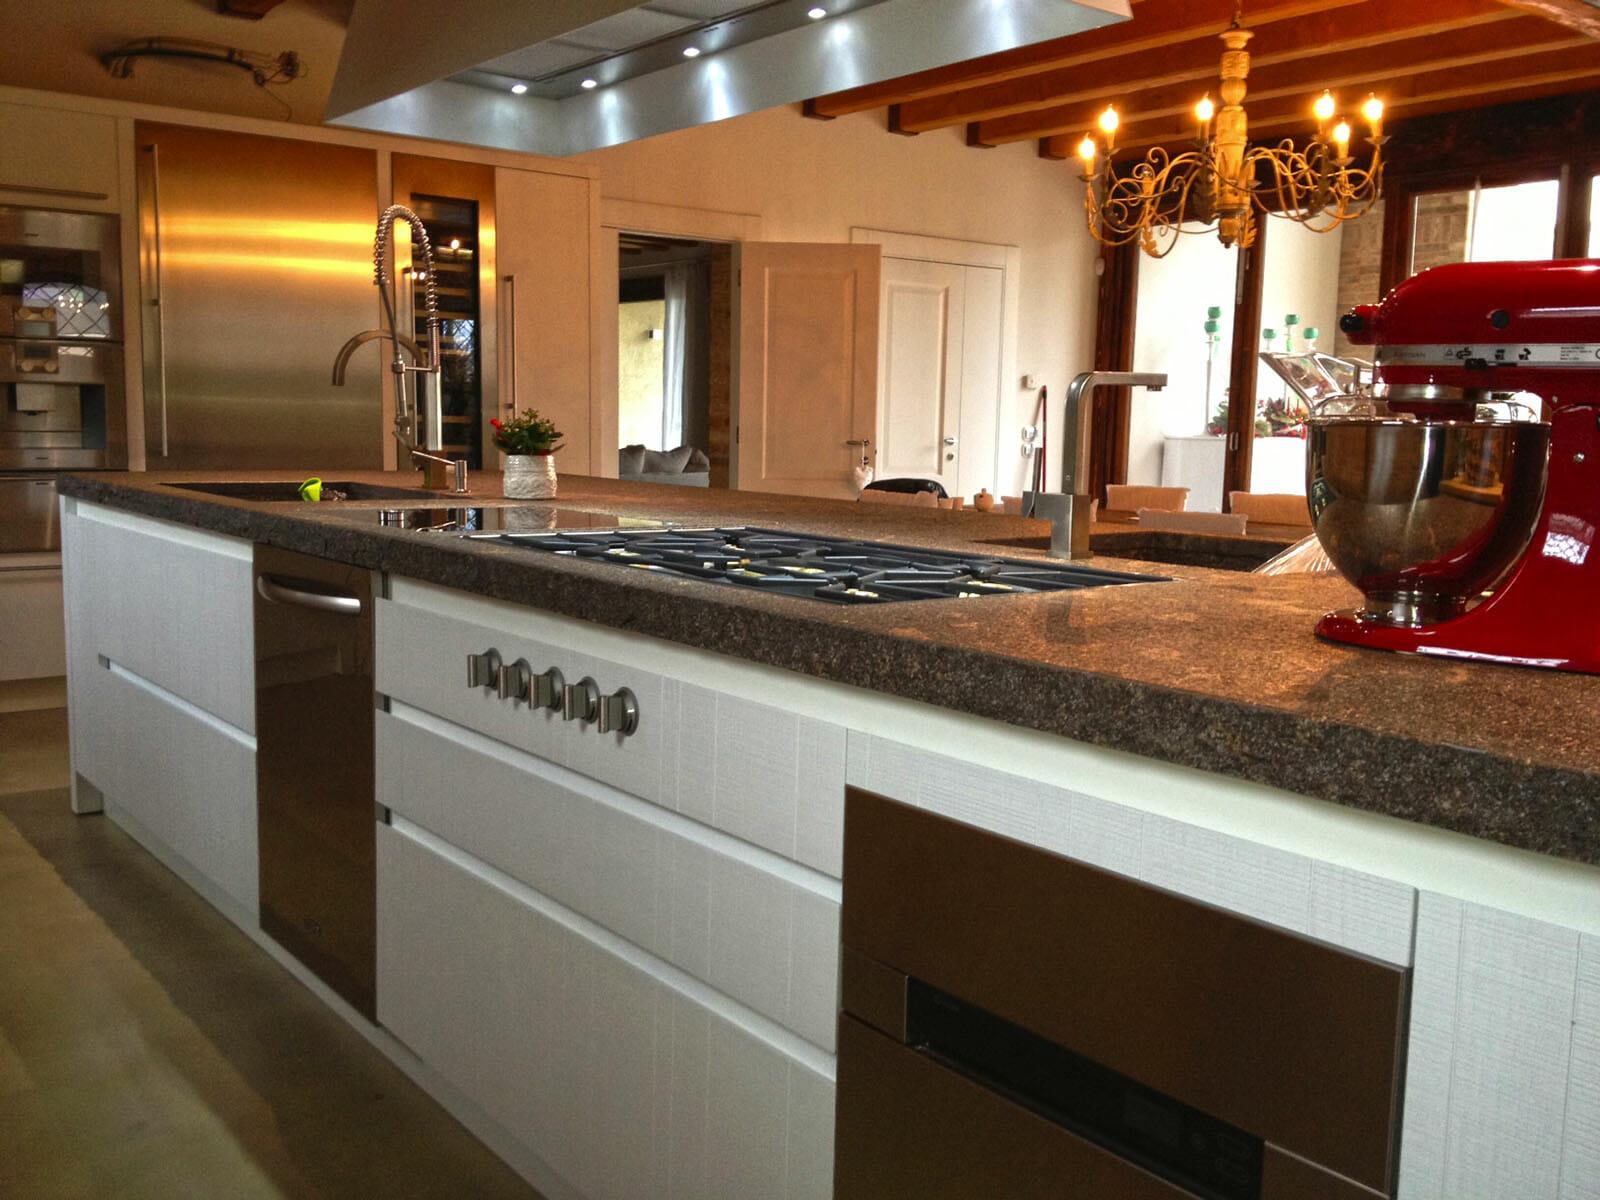 Top cucina ceramica piano cucina in marmo - Top marmo cucina prezzi ...